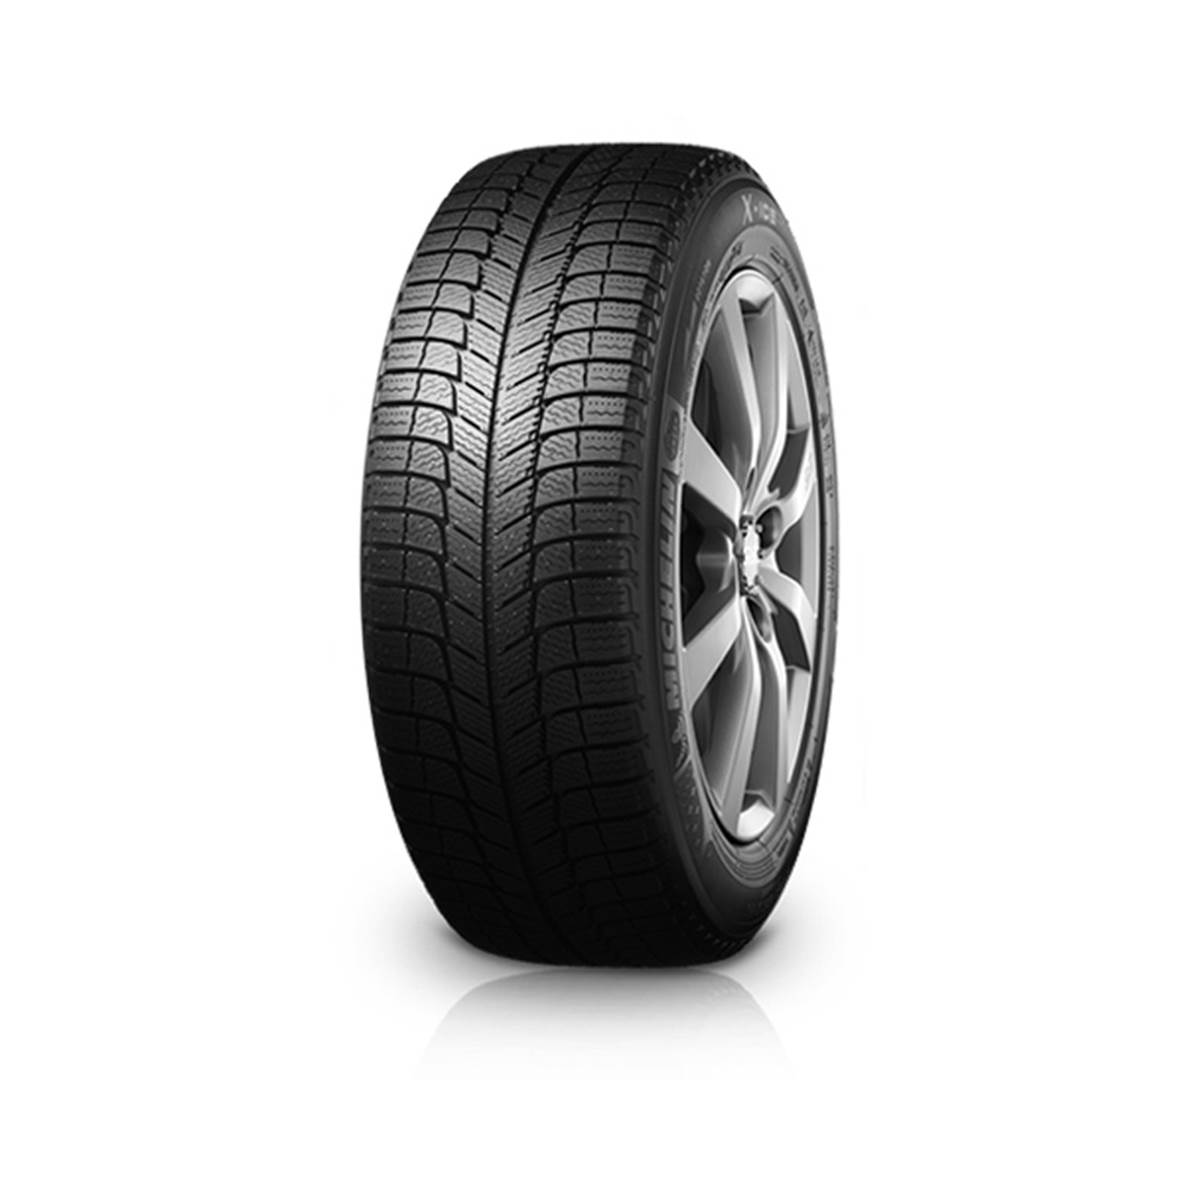 Pneu Hiver Michelin 205/60R16 96H X-Ice Xi3 XL